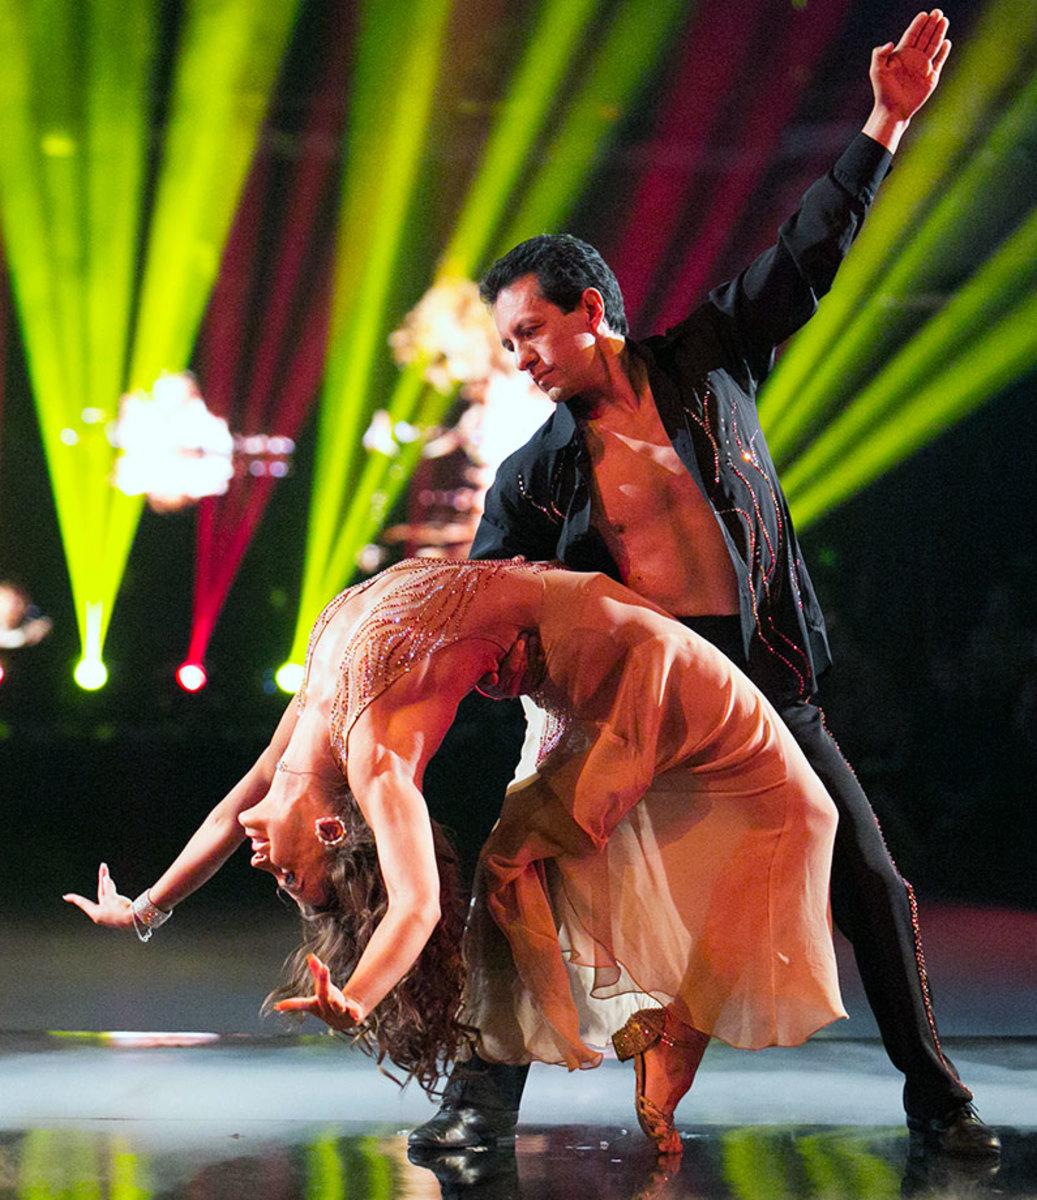 DWTS-Season-21-Victor-Espinoza-Karina-Smirnoff.jpg